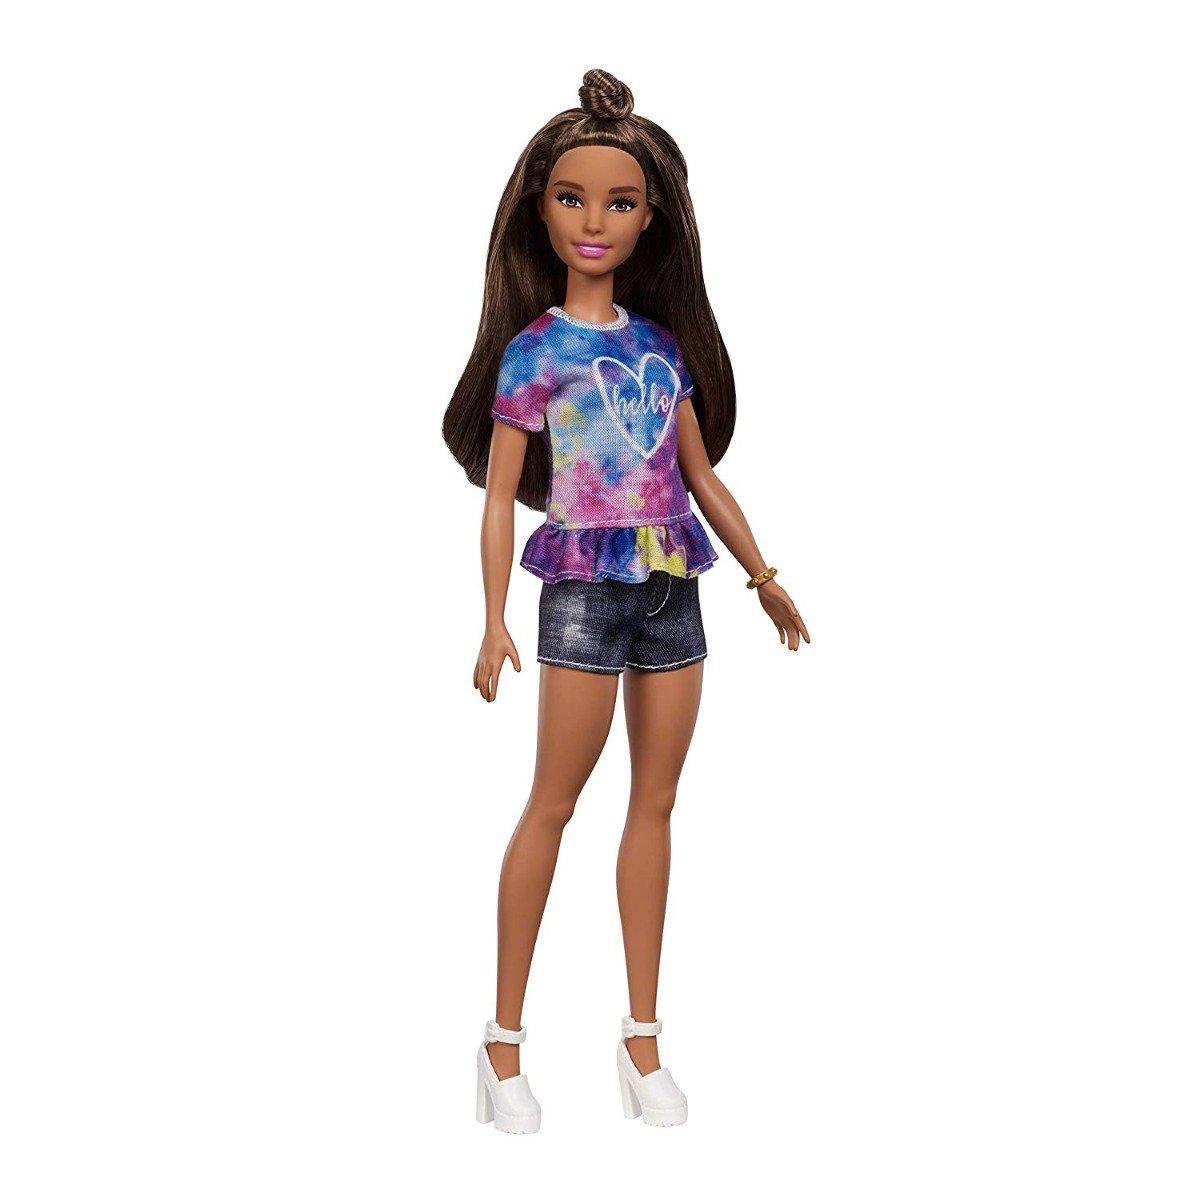 Papusa Barbie Fashionistas - Style, FYB31